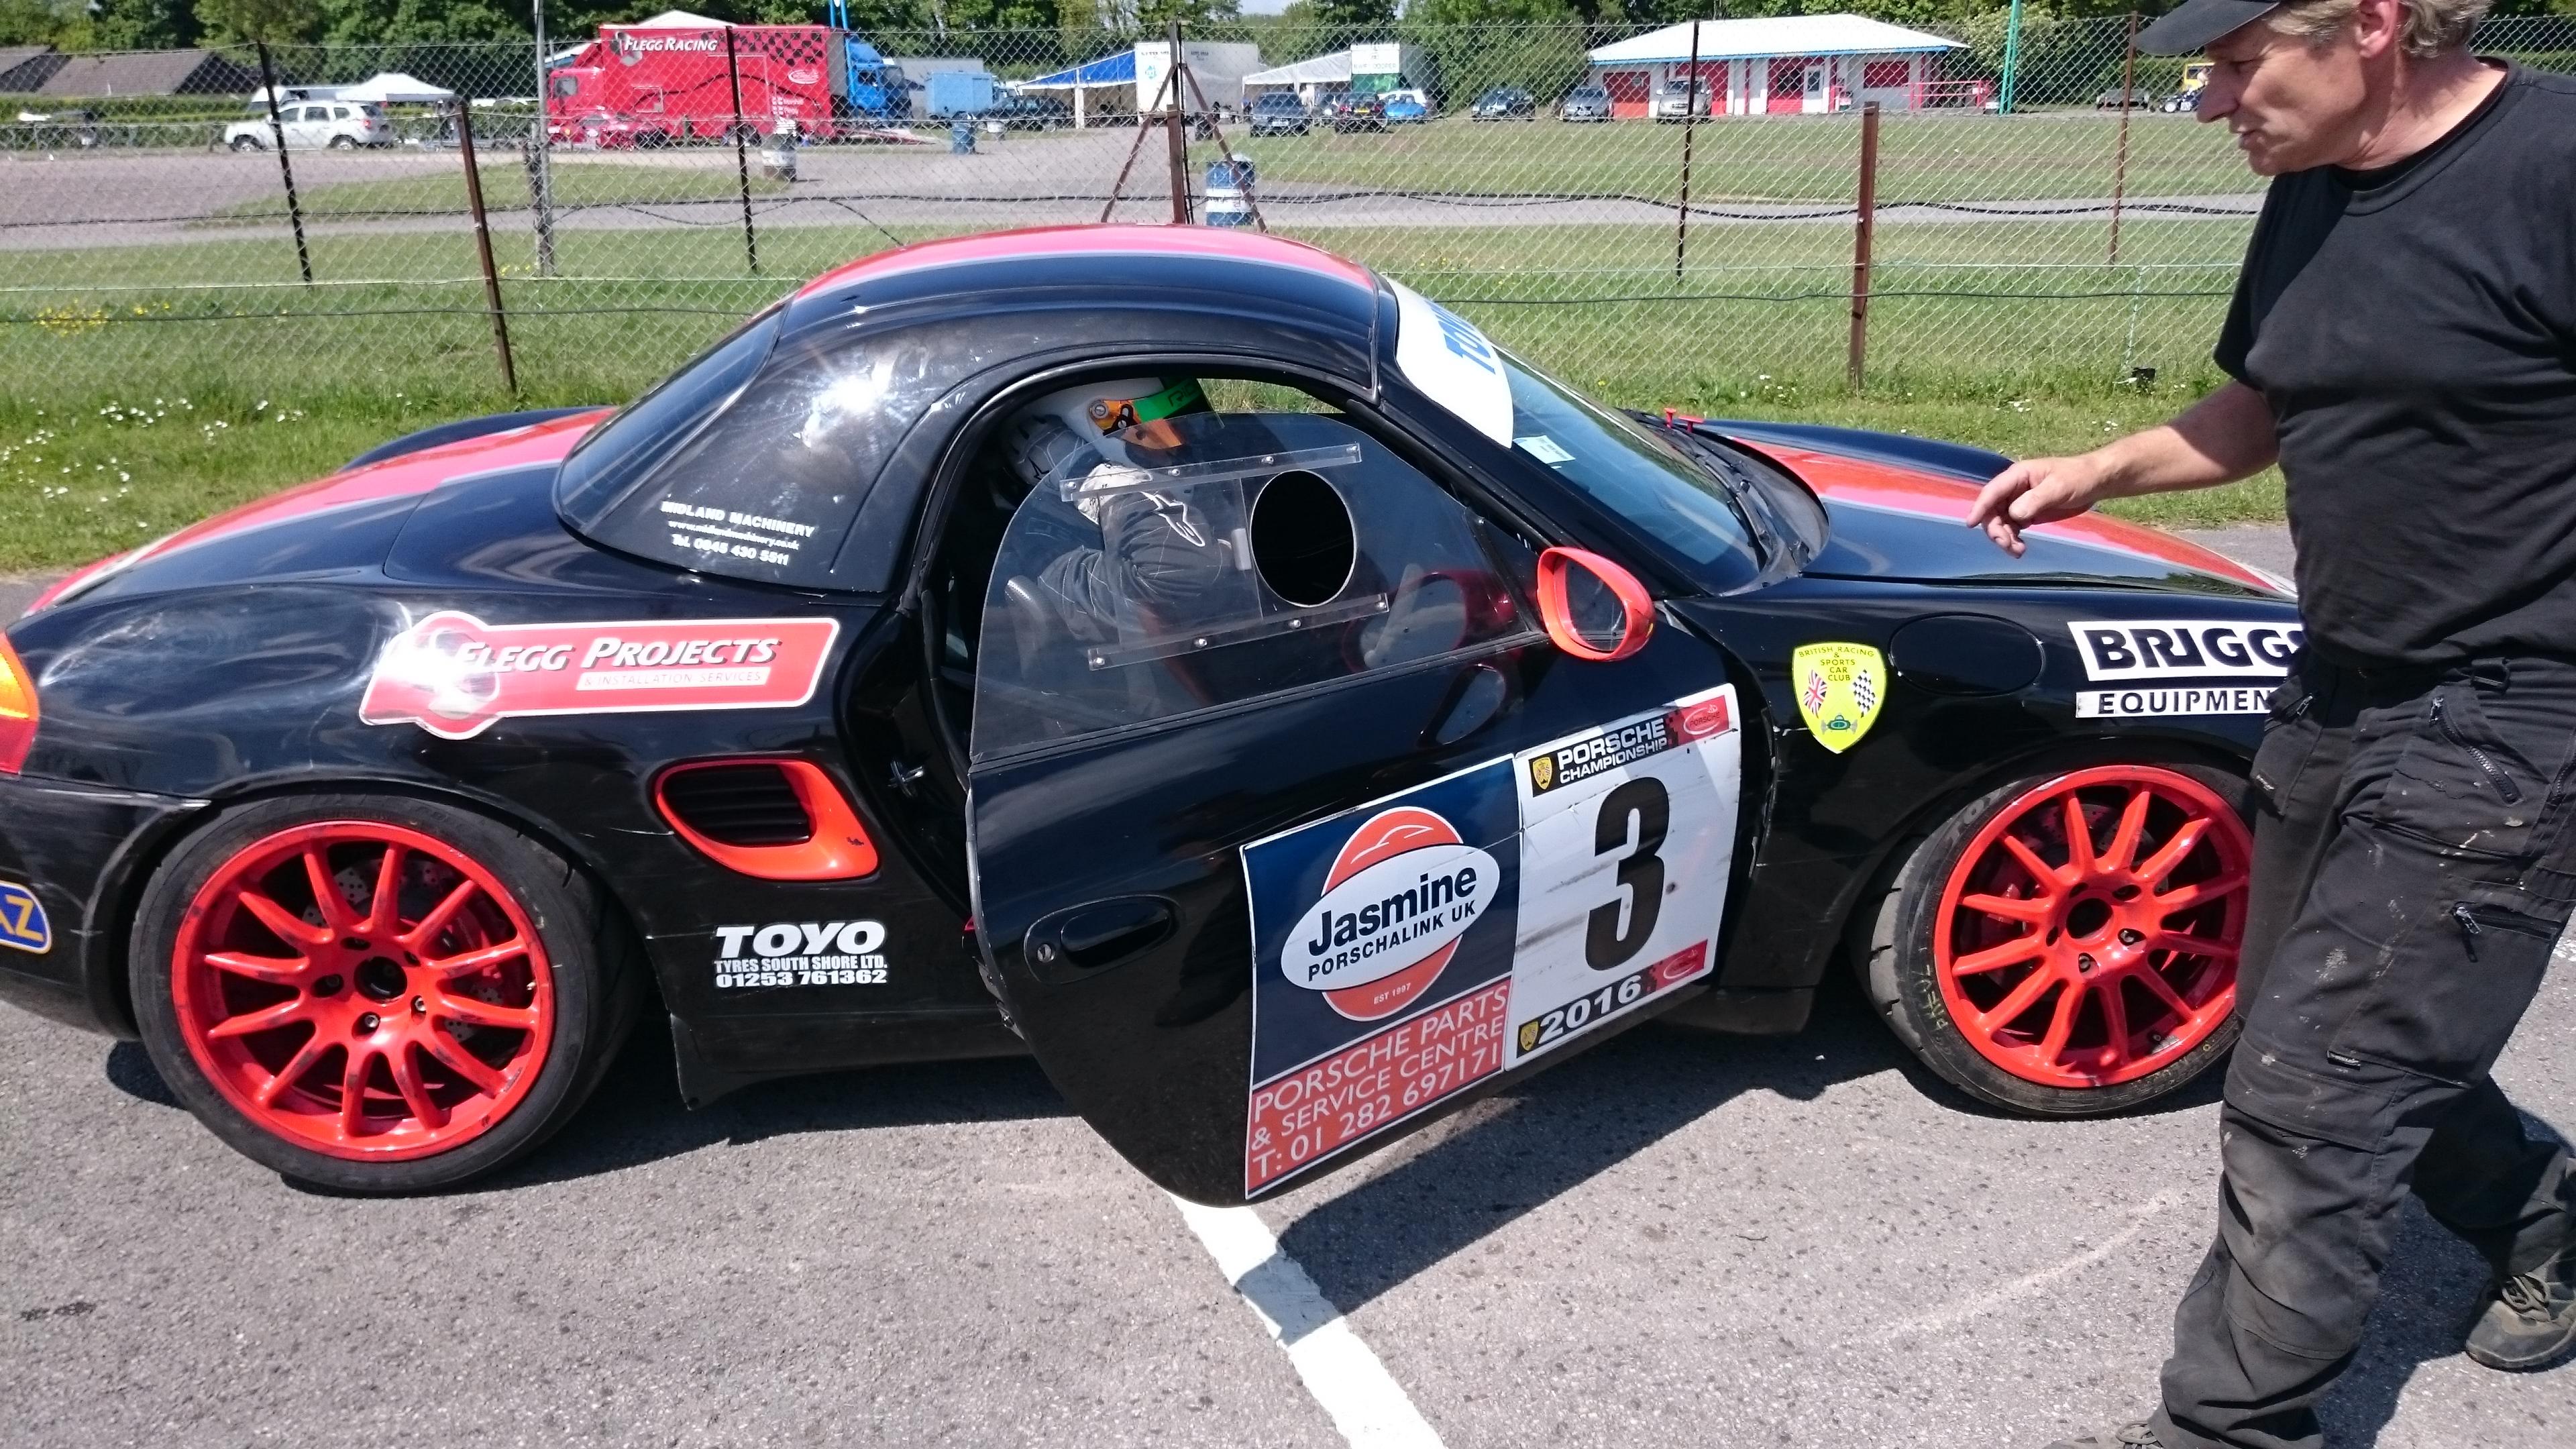 College racer tests Porsche car | Weston College on scion racer, audi racer, cadillac racer, morgan racer, mercedes racer, jeep racer, corvette racer, chevy racer, mg racer, camaro racer, lamborghini racer, packard racer, sunbeam racer, mini racer, toyota racer,